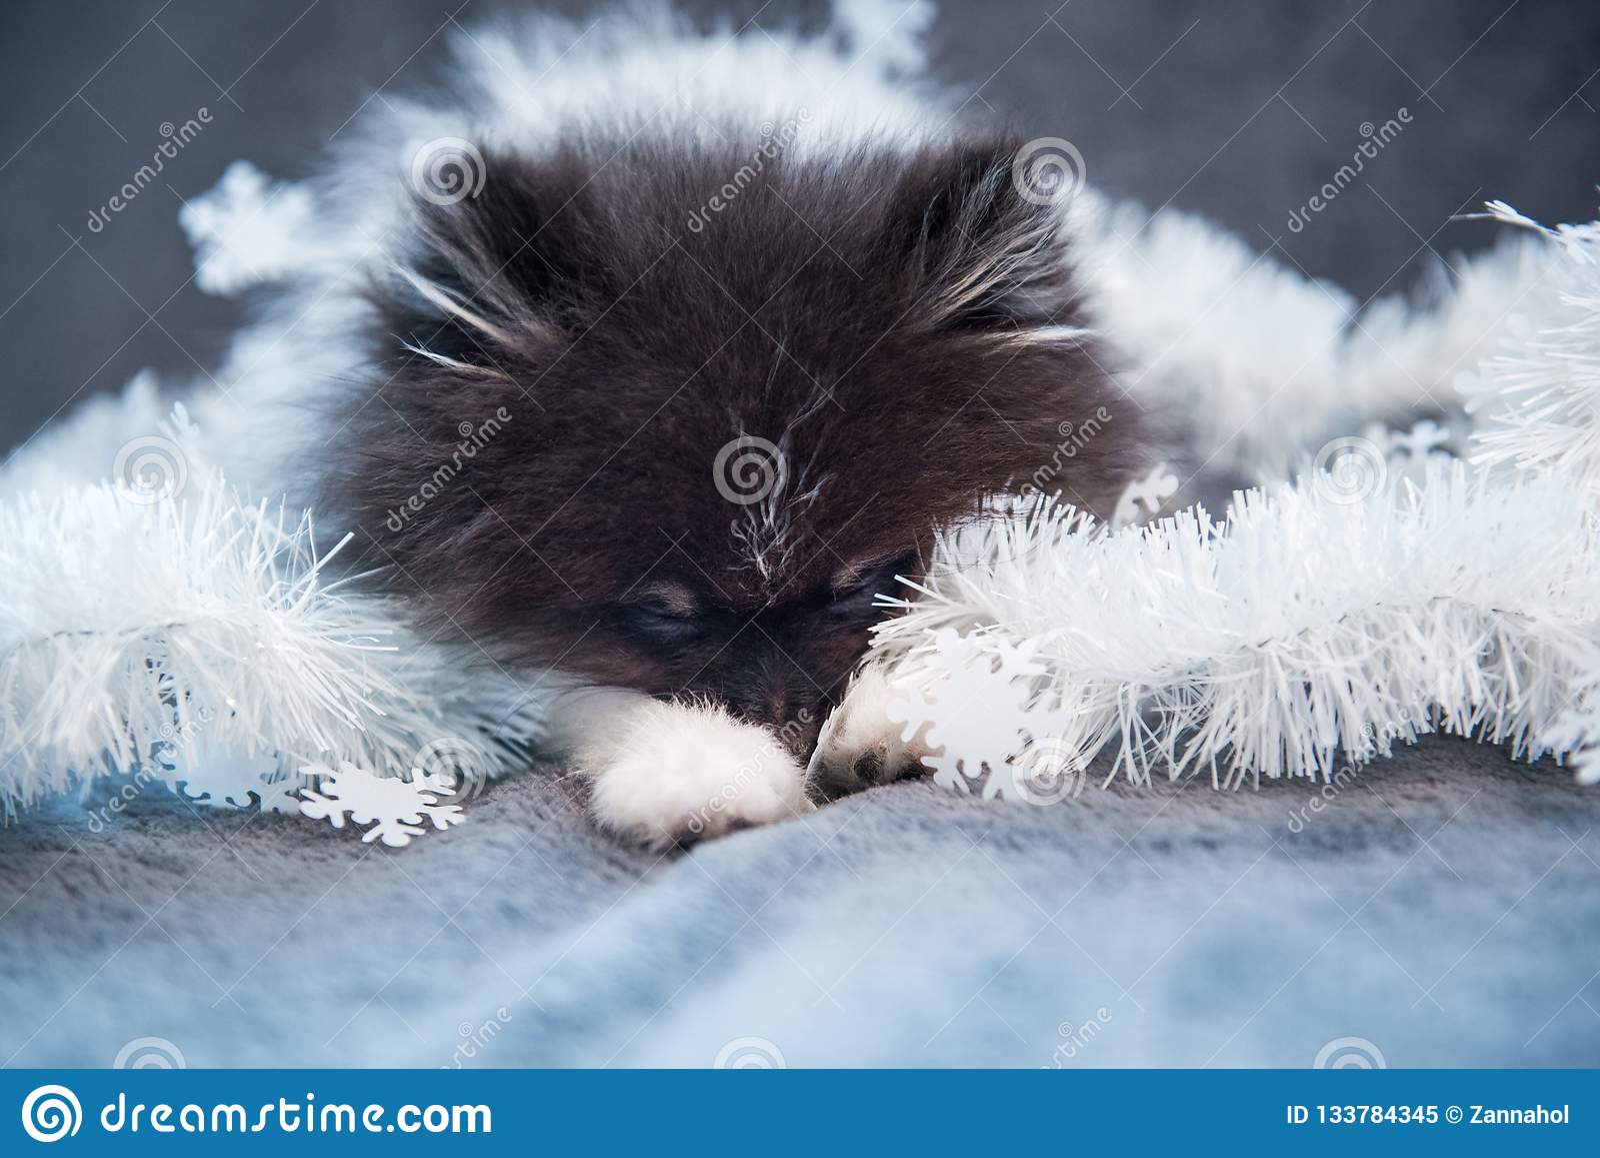 Pomeranian波美丝毛狗狗小狗在诗歌选睡觉